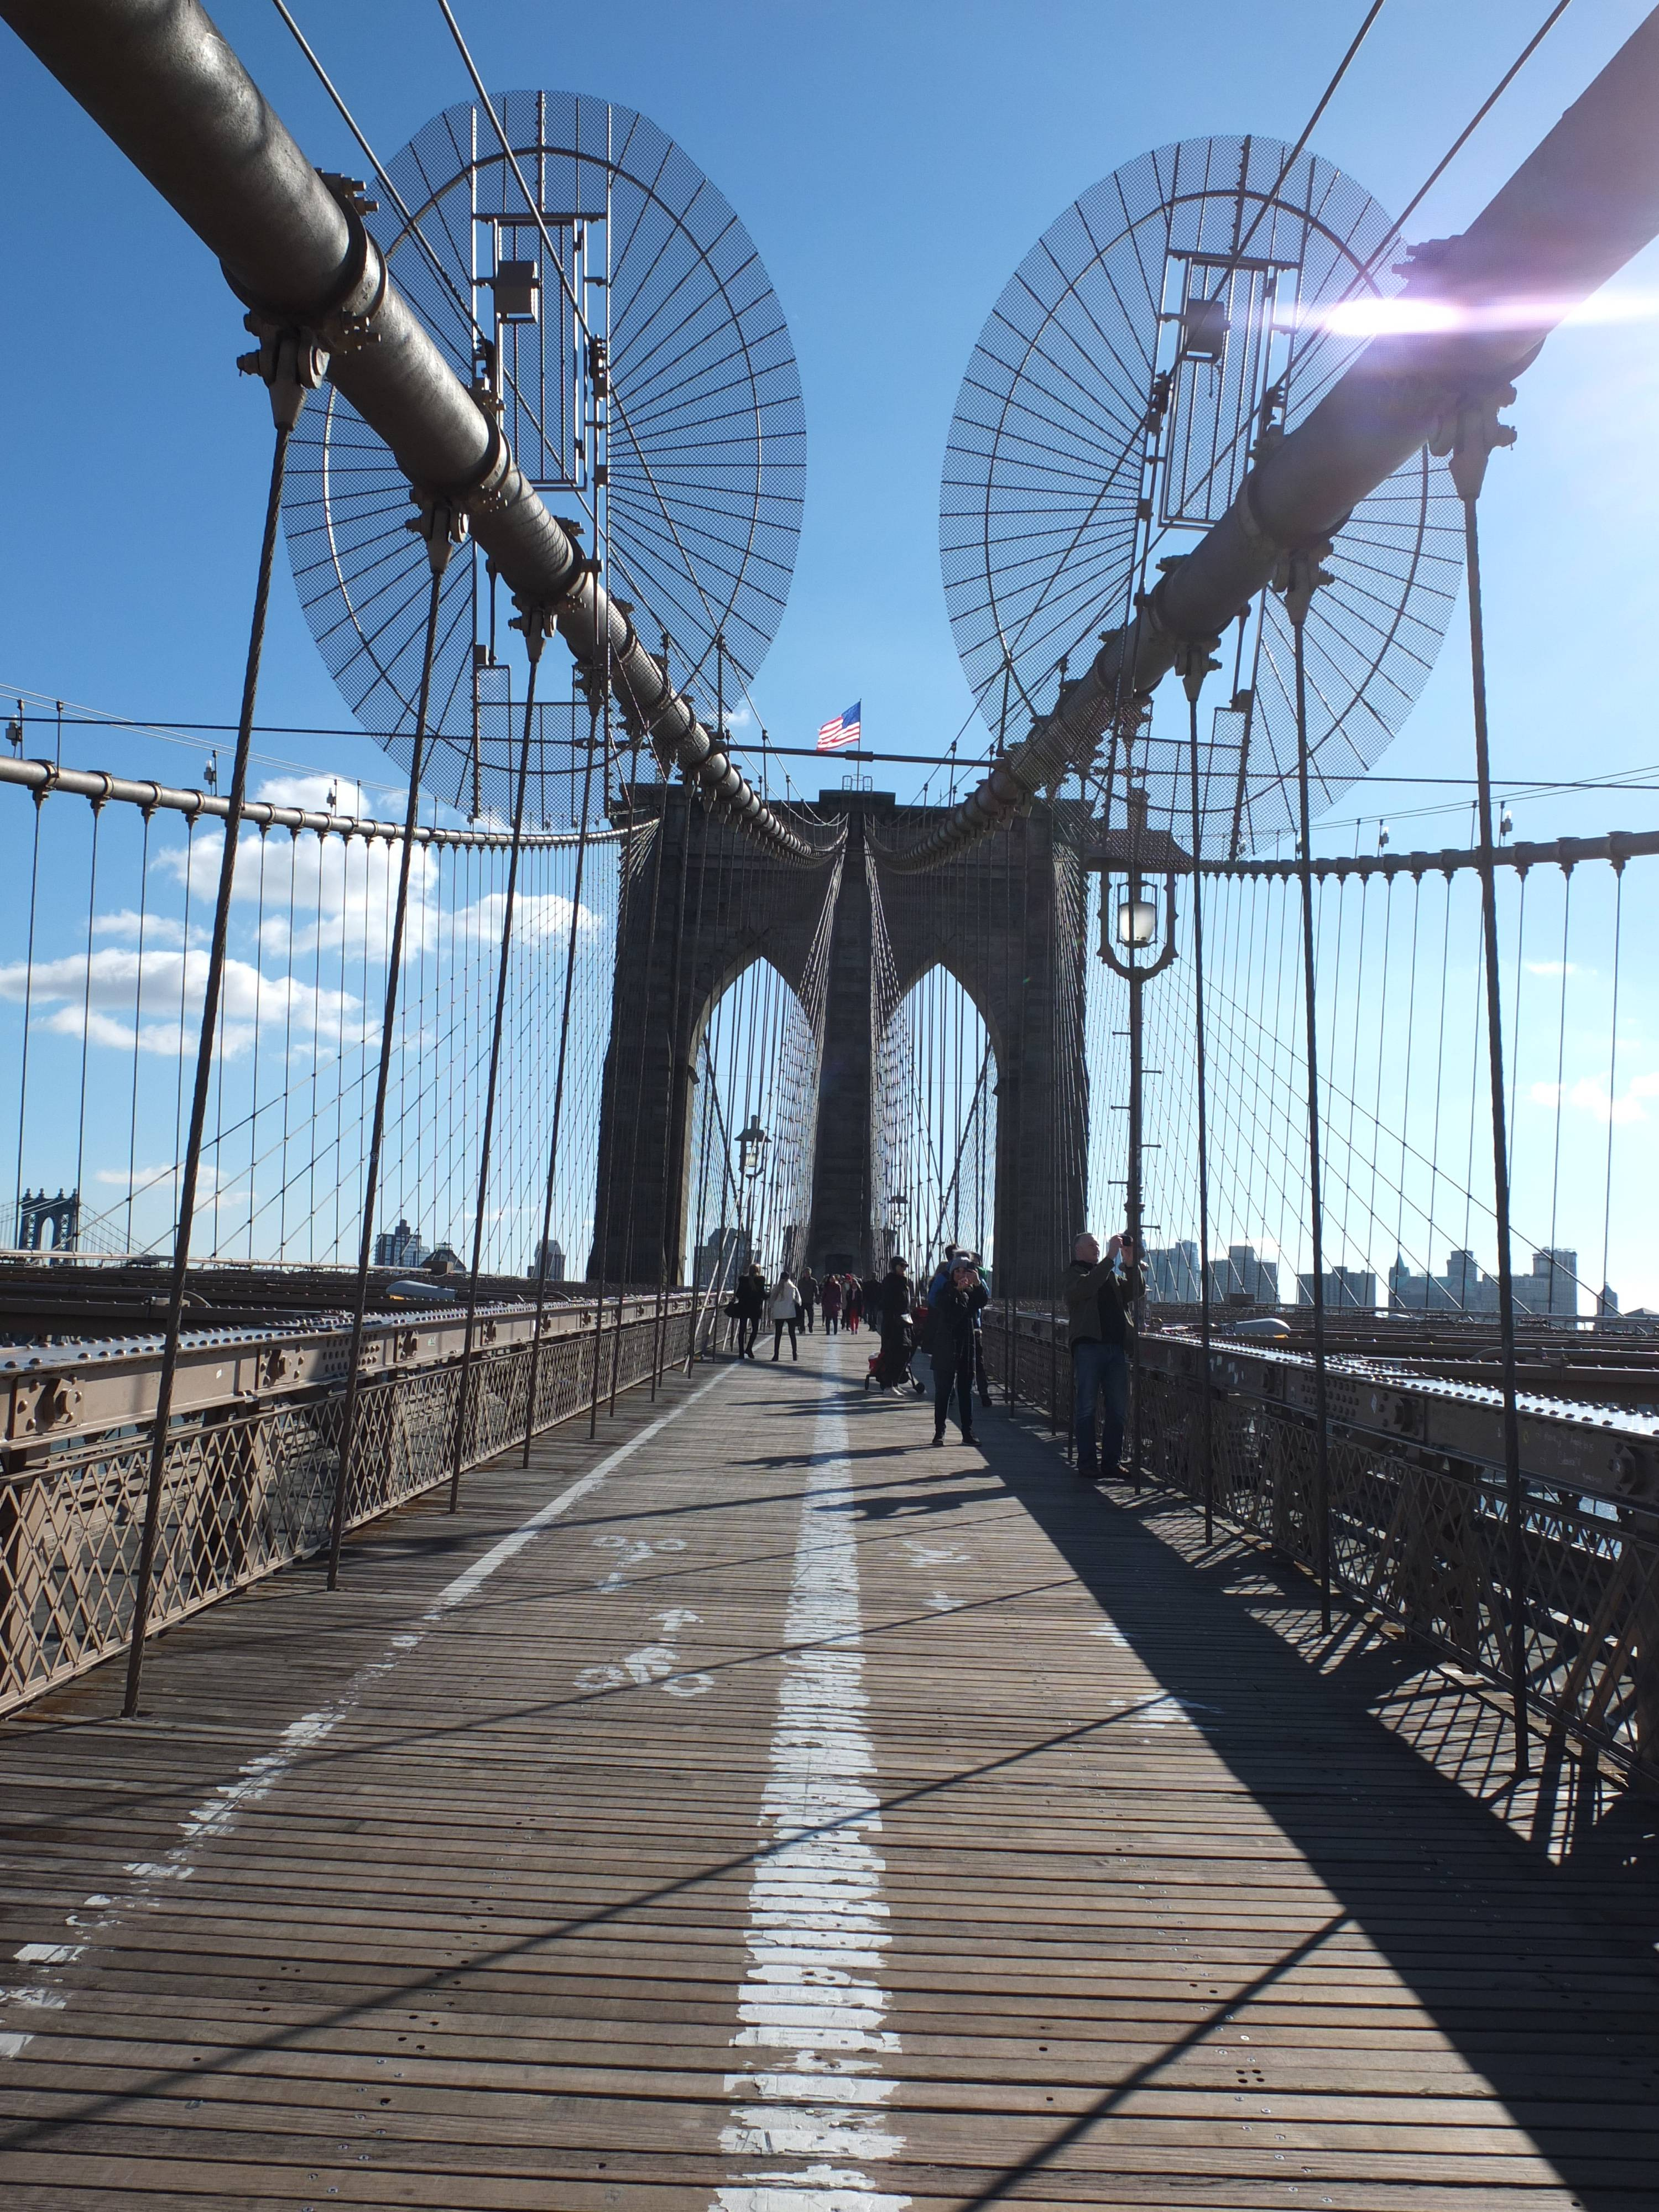 Photo 3: La traversée de Brooklyn Bridge, un classique qui en vaut le coup !